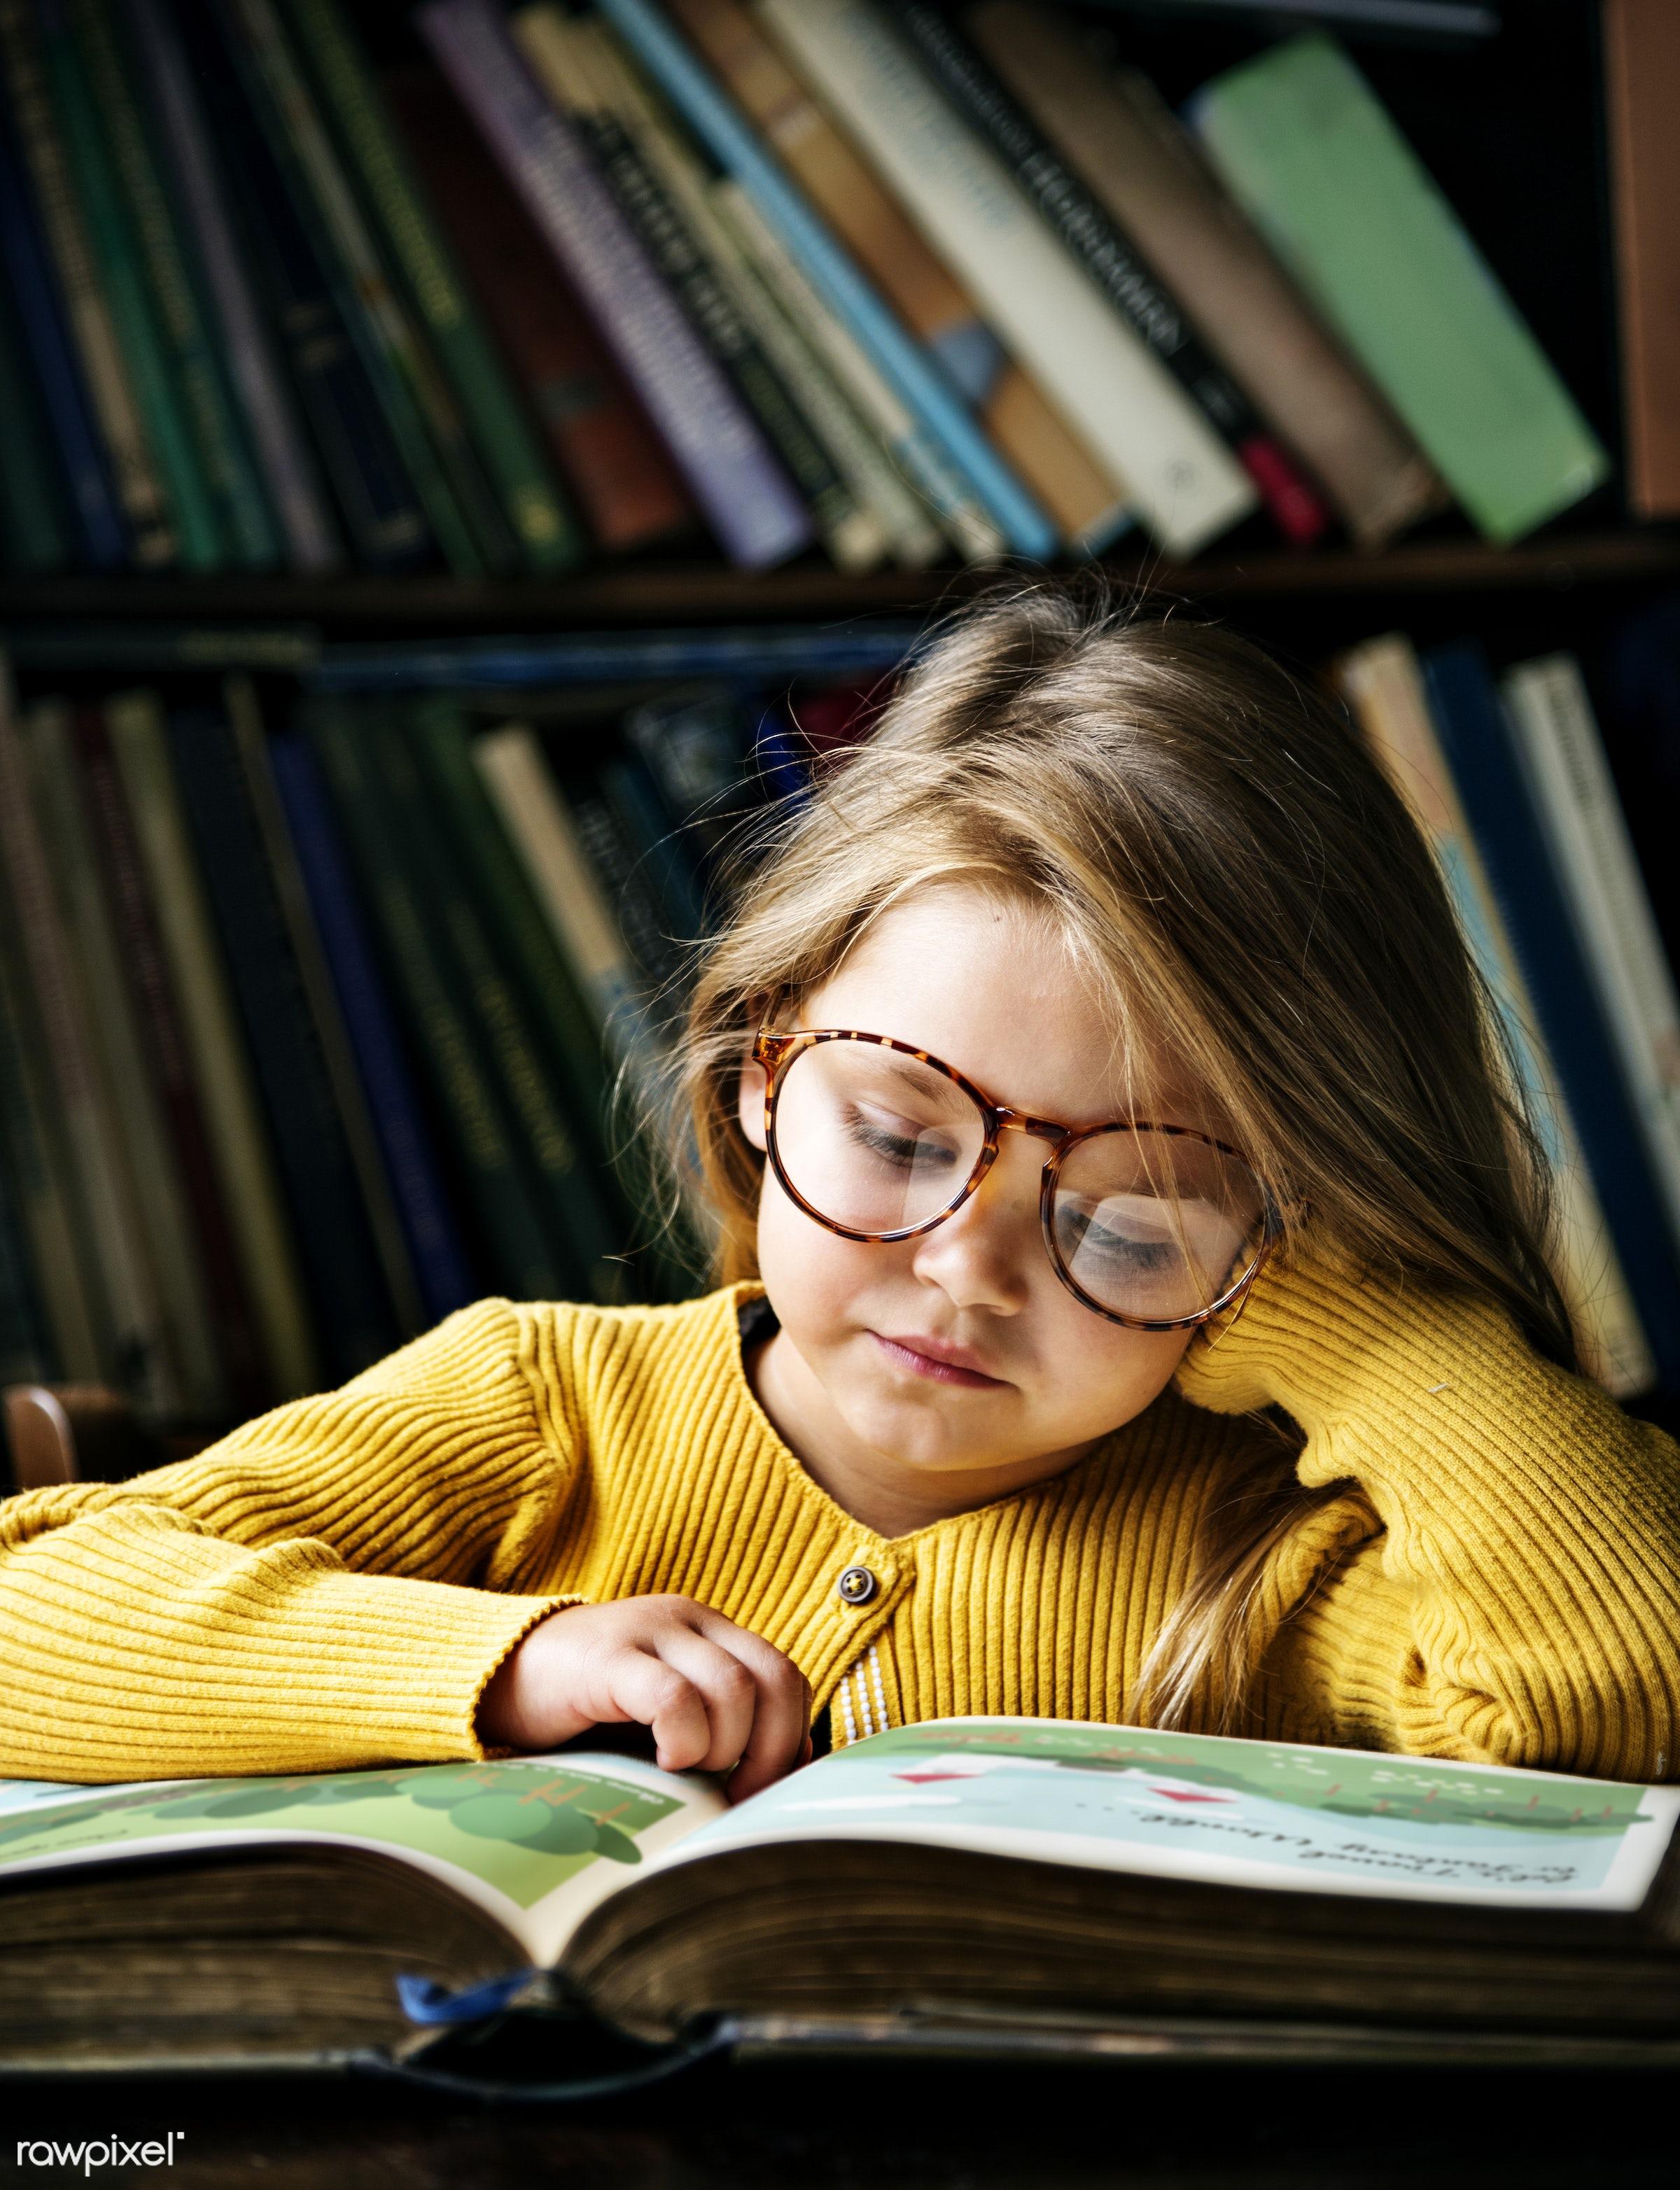 art, beautiful, book, bookstore, cape, caucasian, child, childhood, children, class, clever, dress up, education, emotions,...